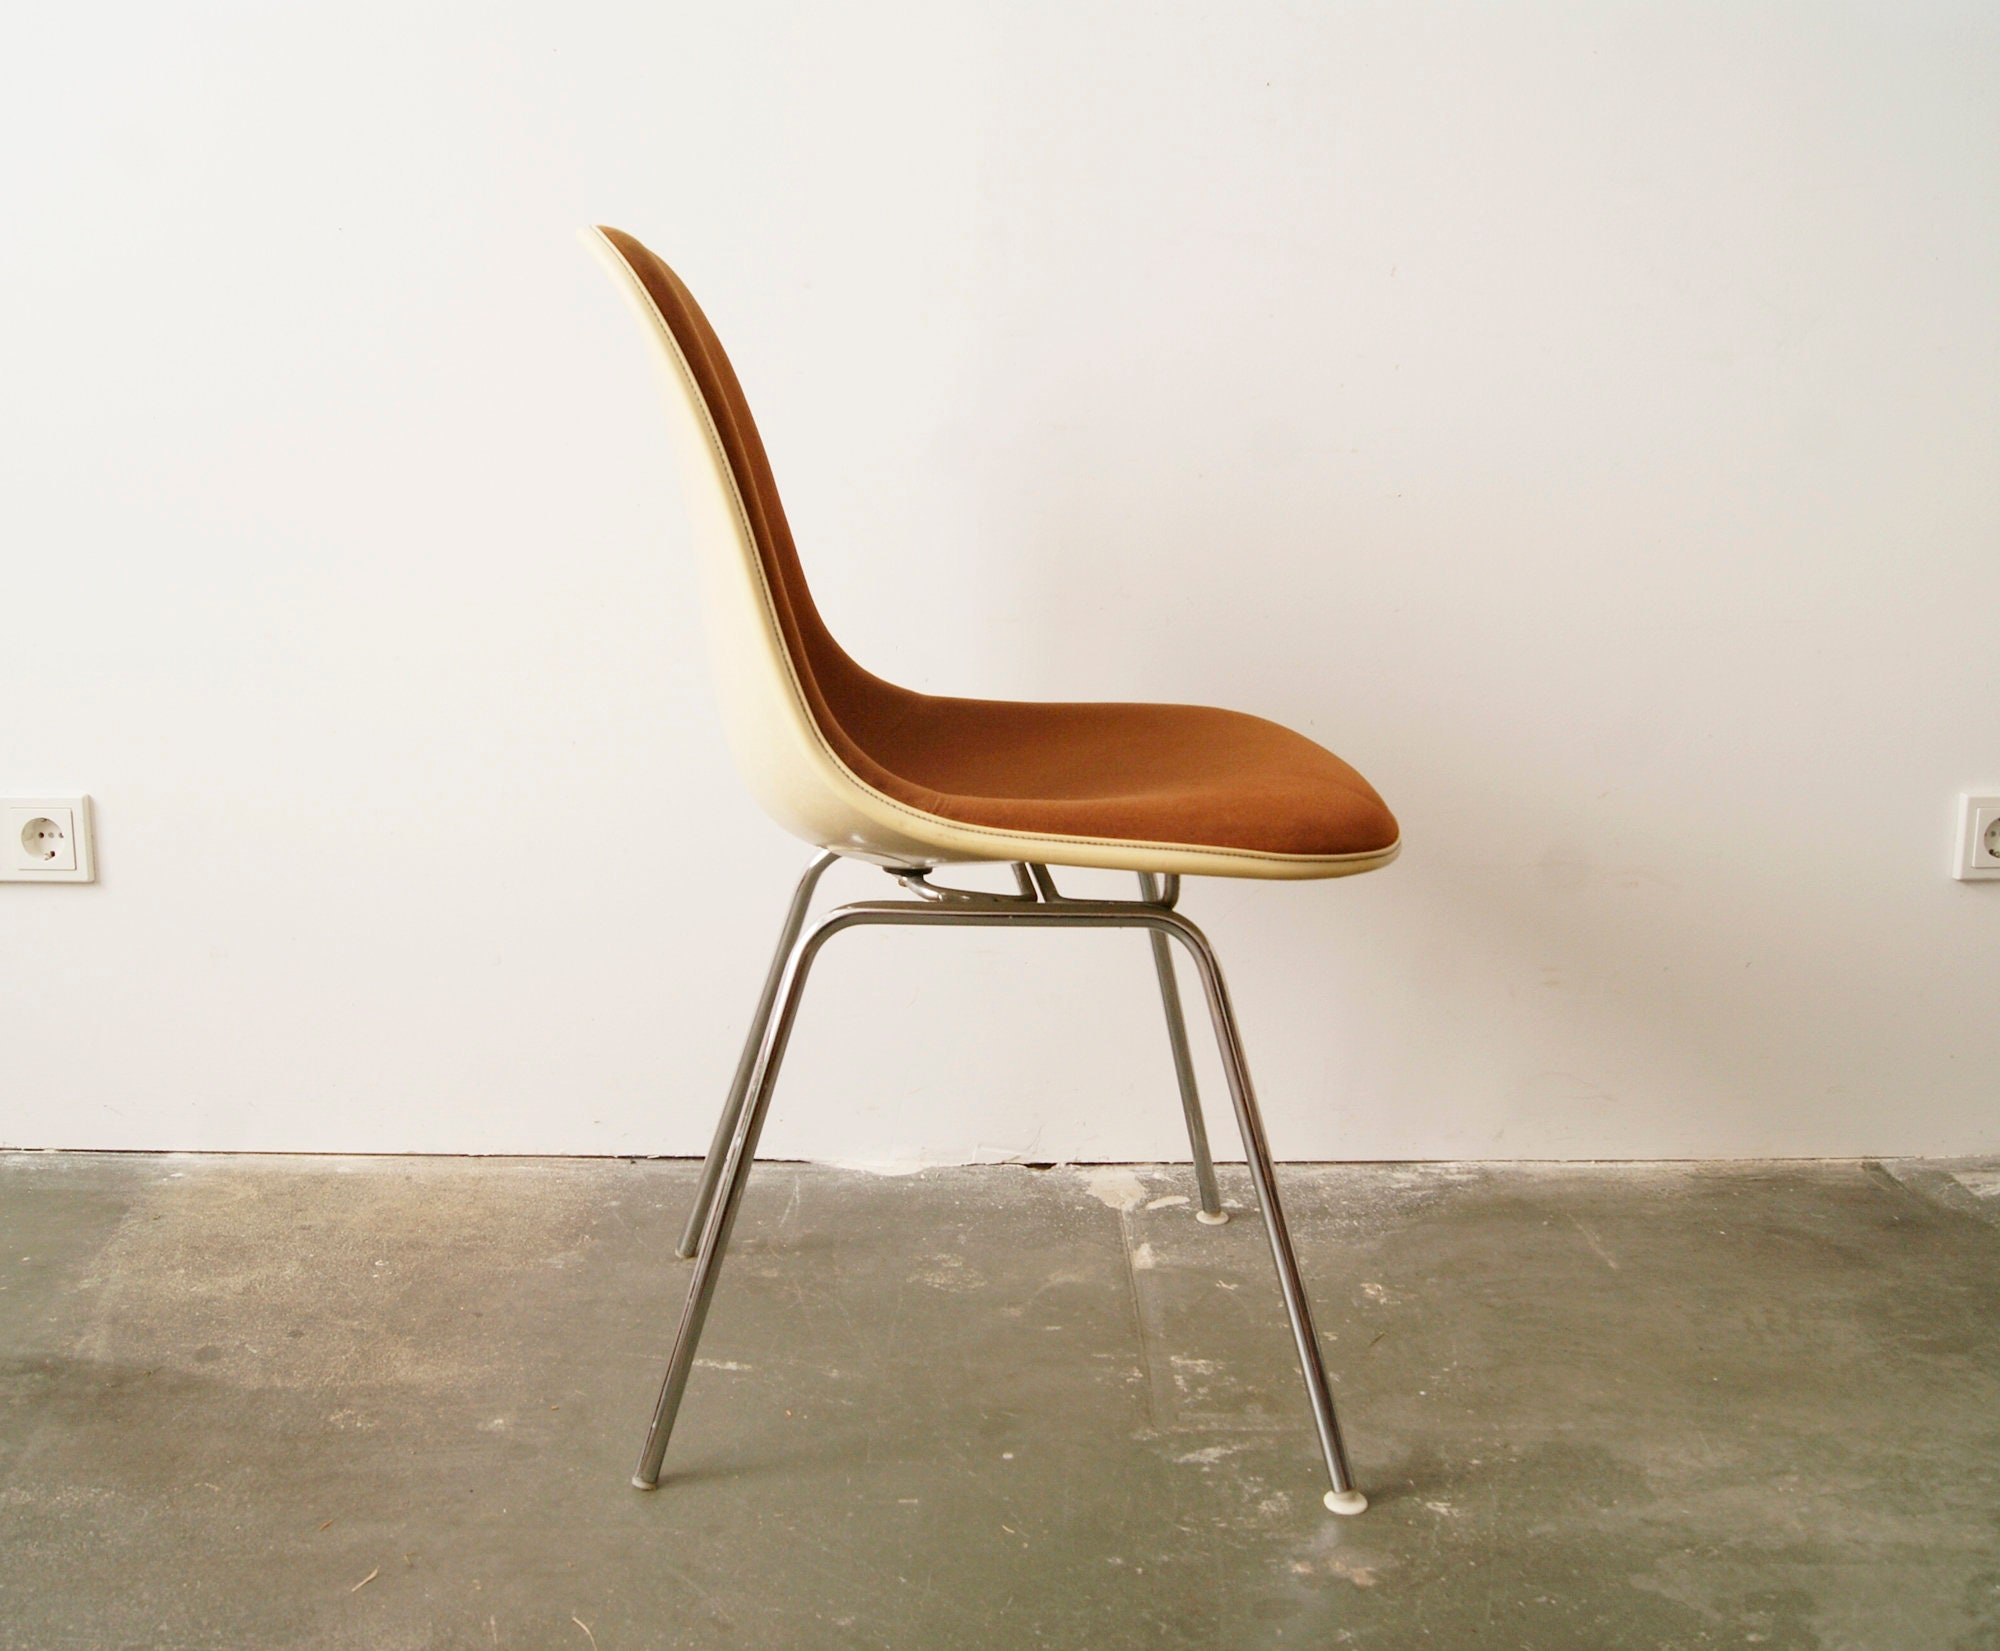 Eames Chair F R Herman Miller Fiberglas Stoff Stuhl Design